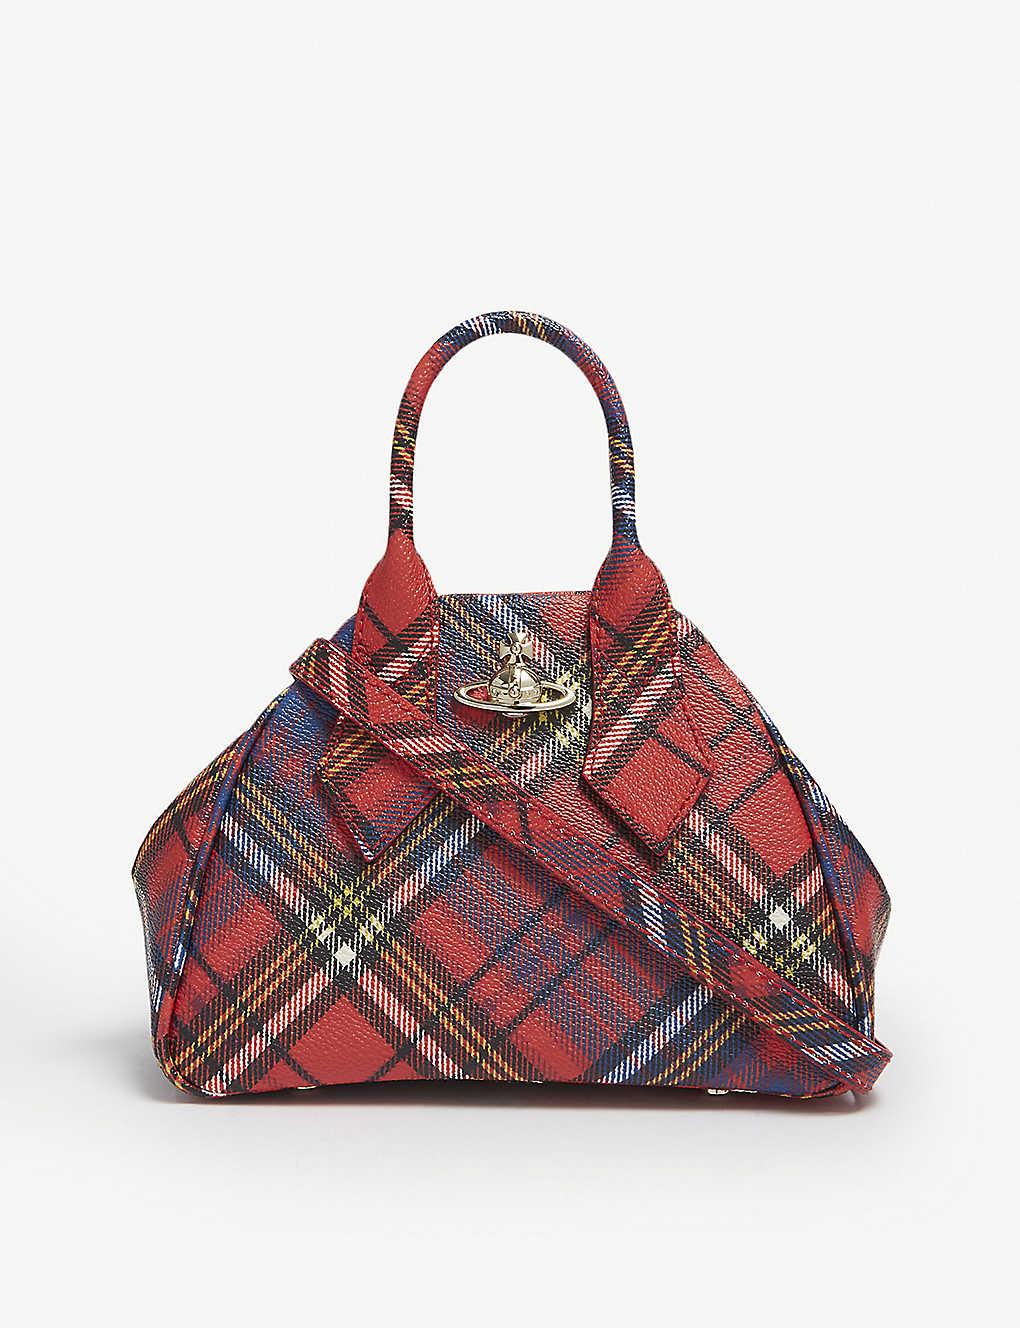 1389d9a1f5 VIVIENNE WESTWOOD - Yasmine derby handbag | Selfridges.com